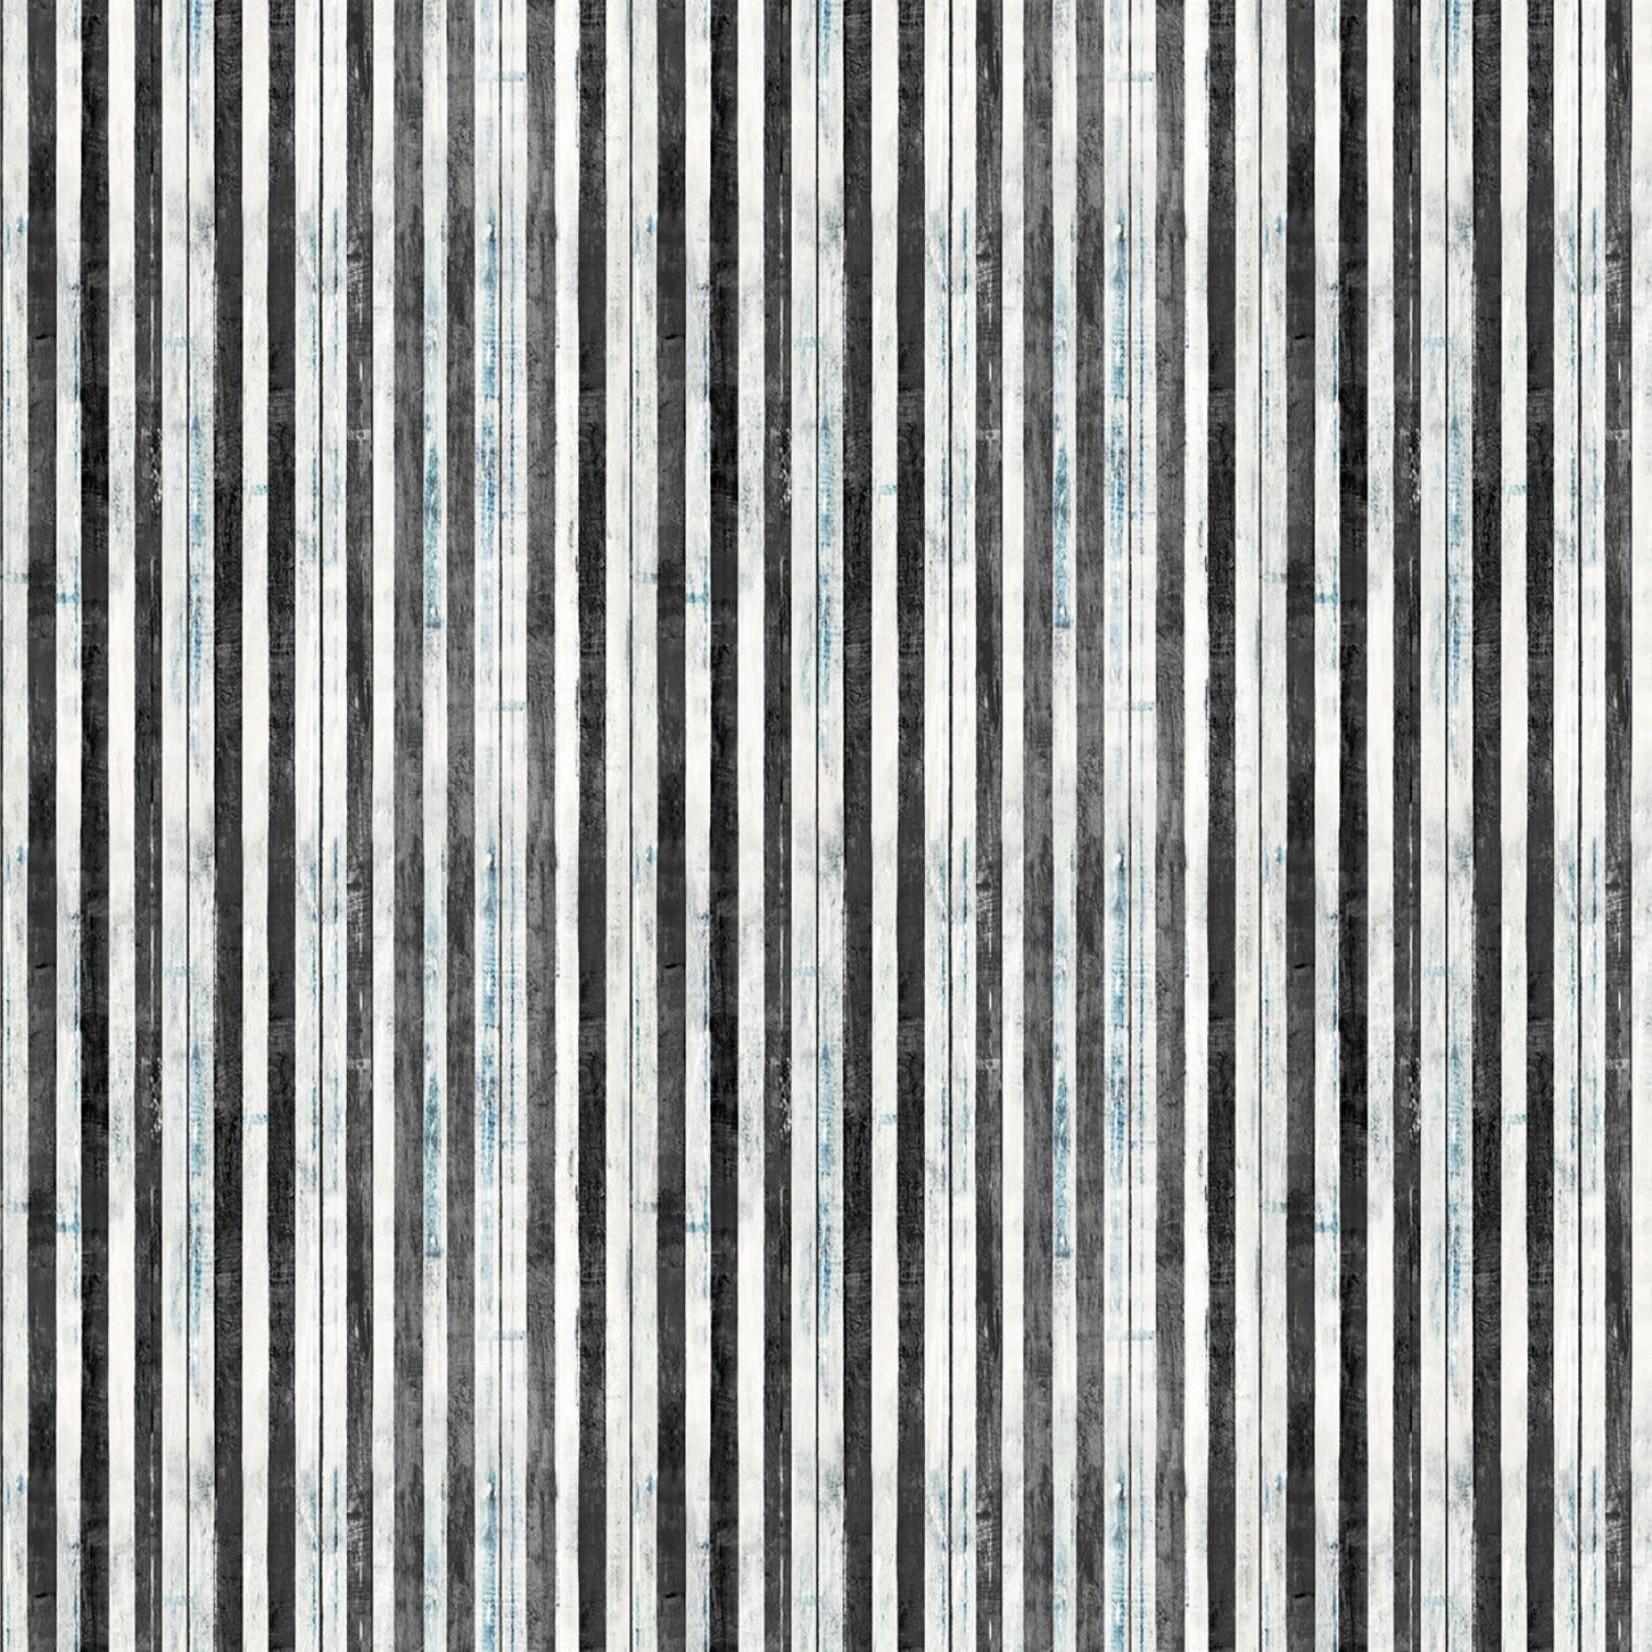 Wilmington Prints PER CM OR $21/M INTERLUDE by ARTLY 994 LT BLUE/BLACK